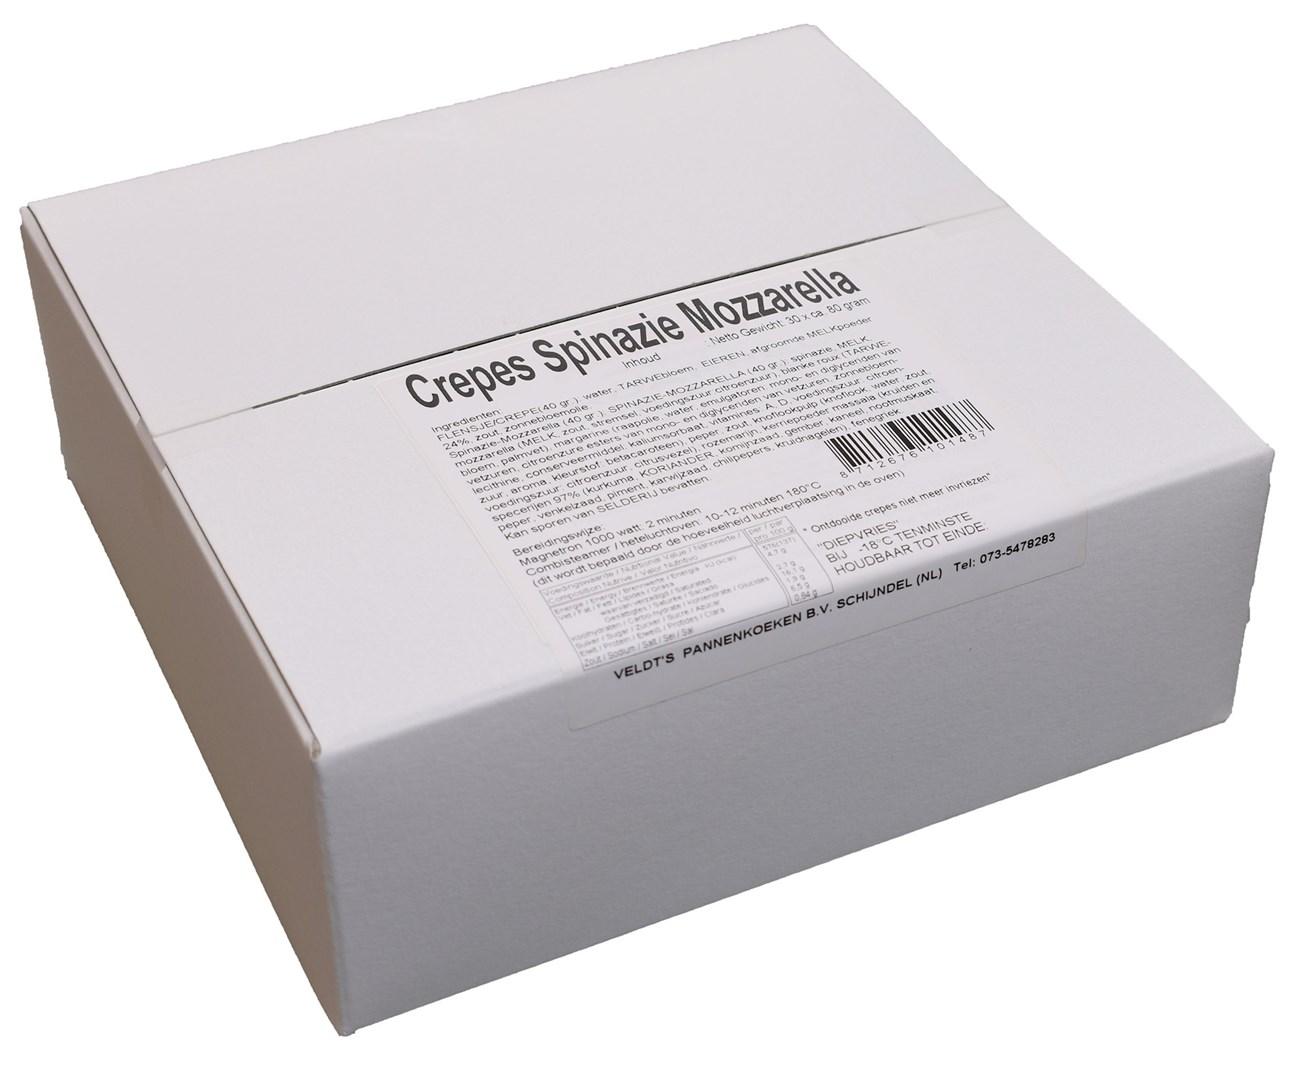 Productafbeelding Flensjes / Crepes Spinazie Mozzarella